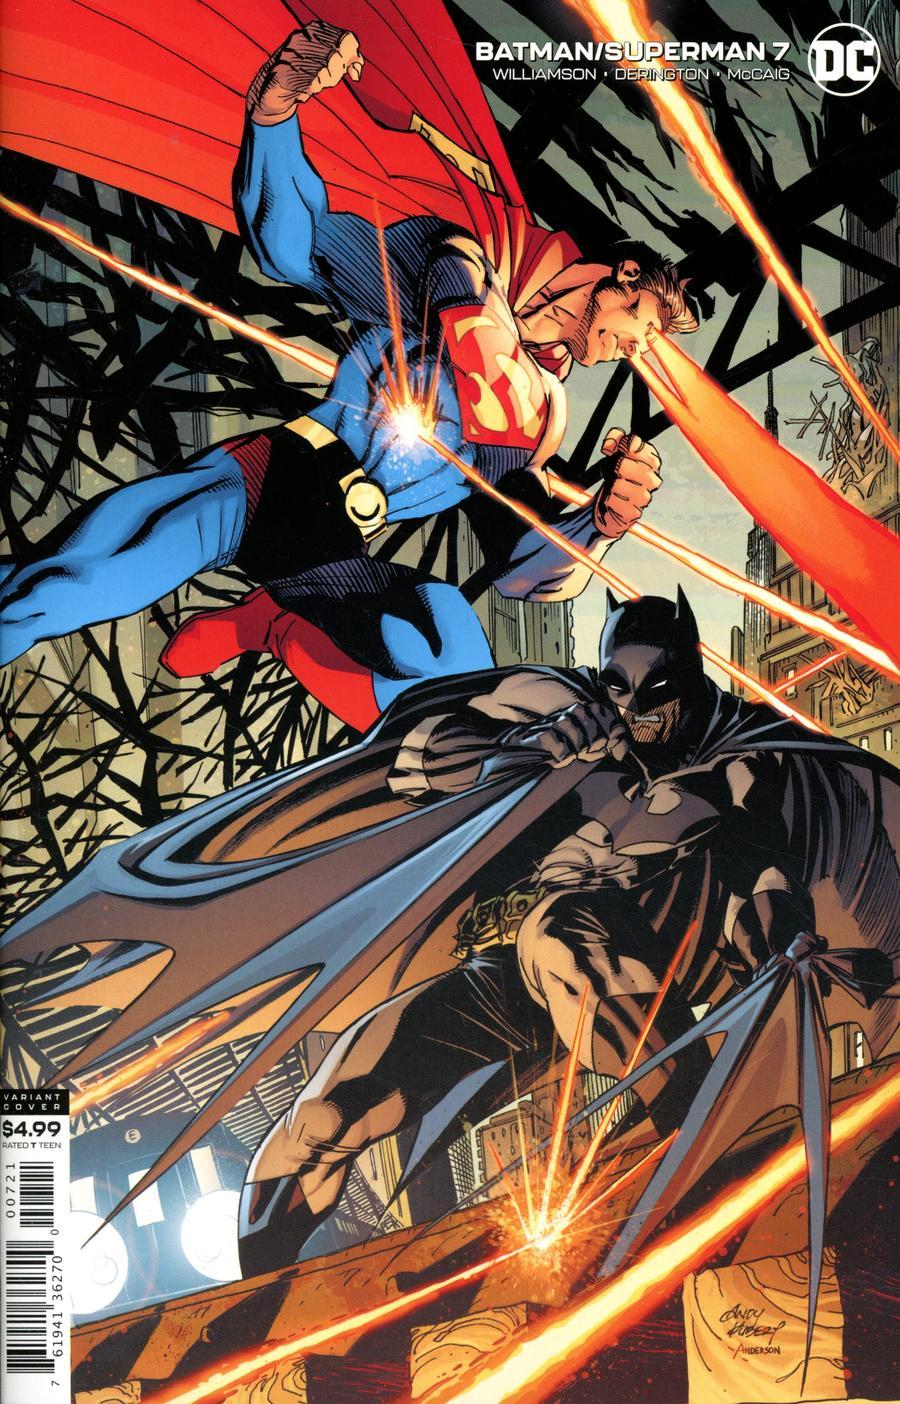 Batman Superman Vol 2 #7 Cover B Variant Andy Kubert Card Stock Cover